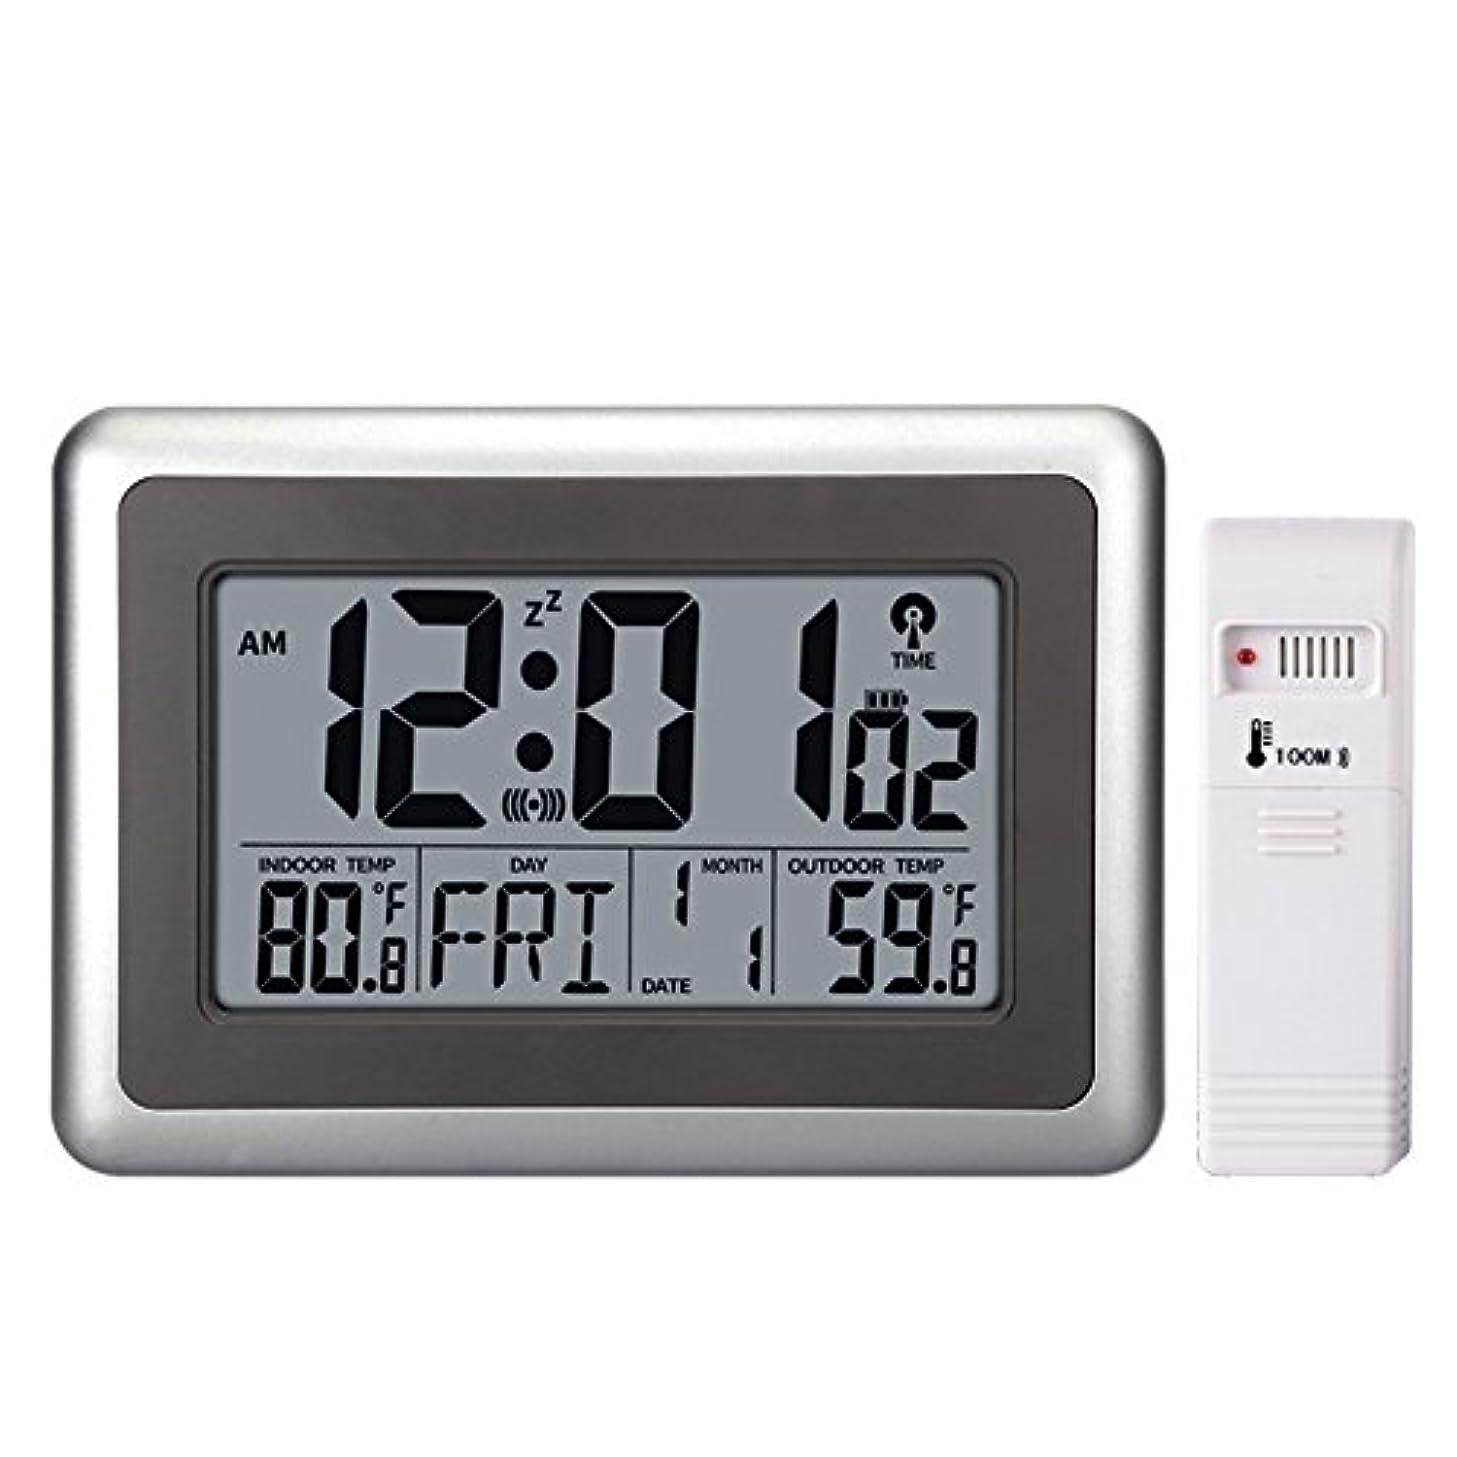 UMEXUS Atomic Wall Desk Clock Large Display with Indoor Outdoor Temperature Date Calendar Digital Alarm Clock Battery Operated for Kitchen Bedroom